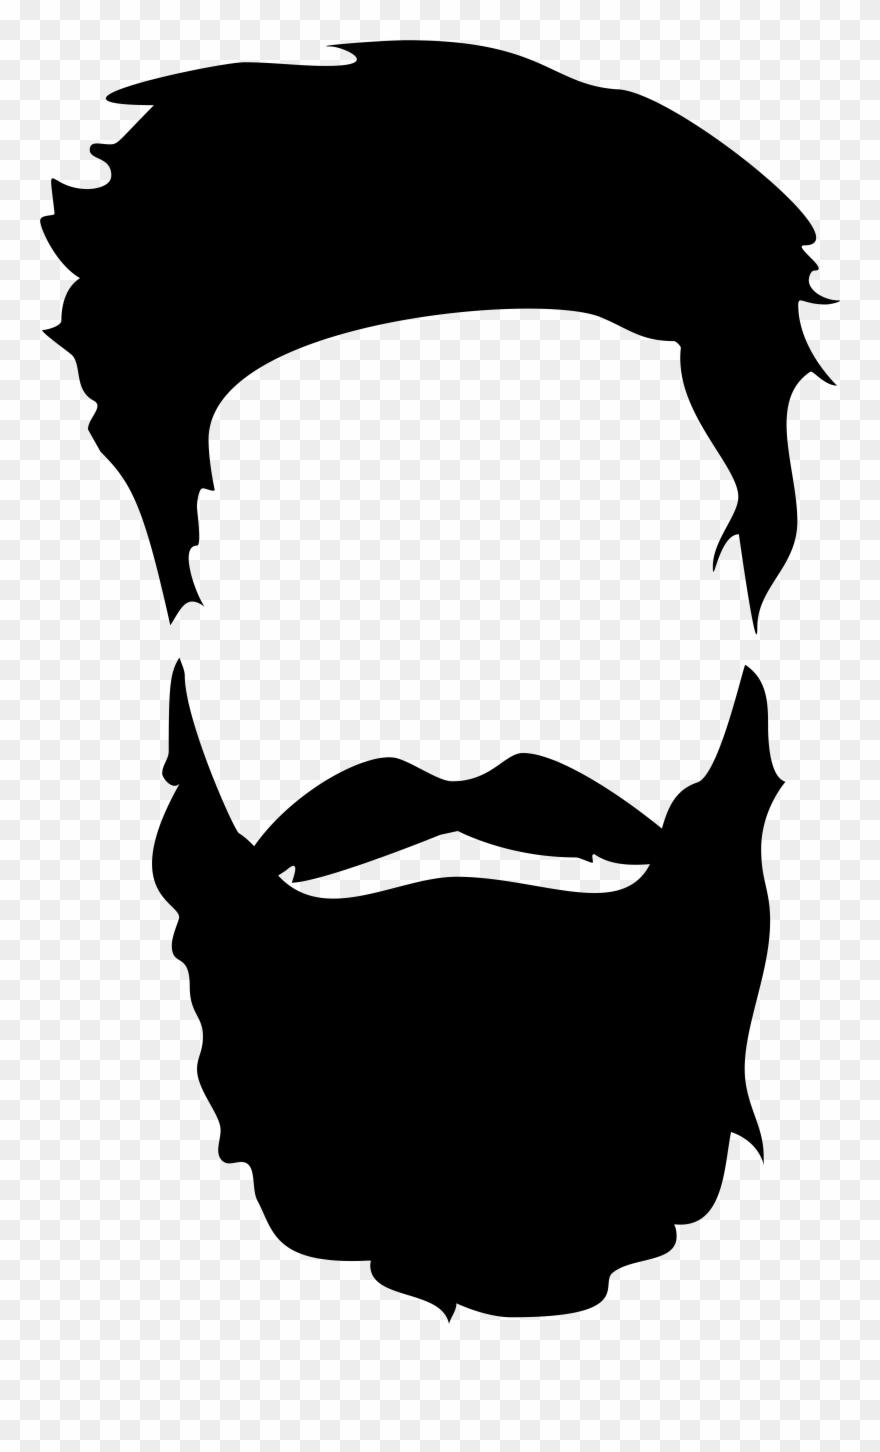 Pin By Heather Marie On Scrapbook Hair And Beard Styles Beard Clipart Beard No Mustache